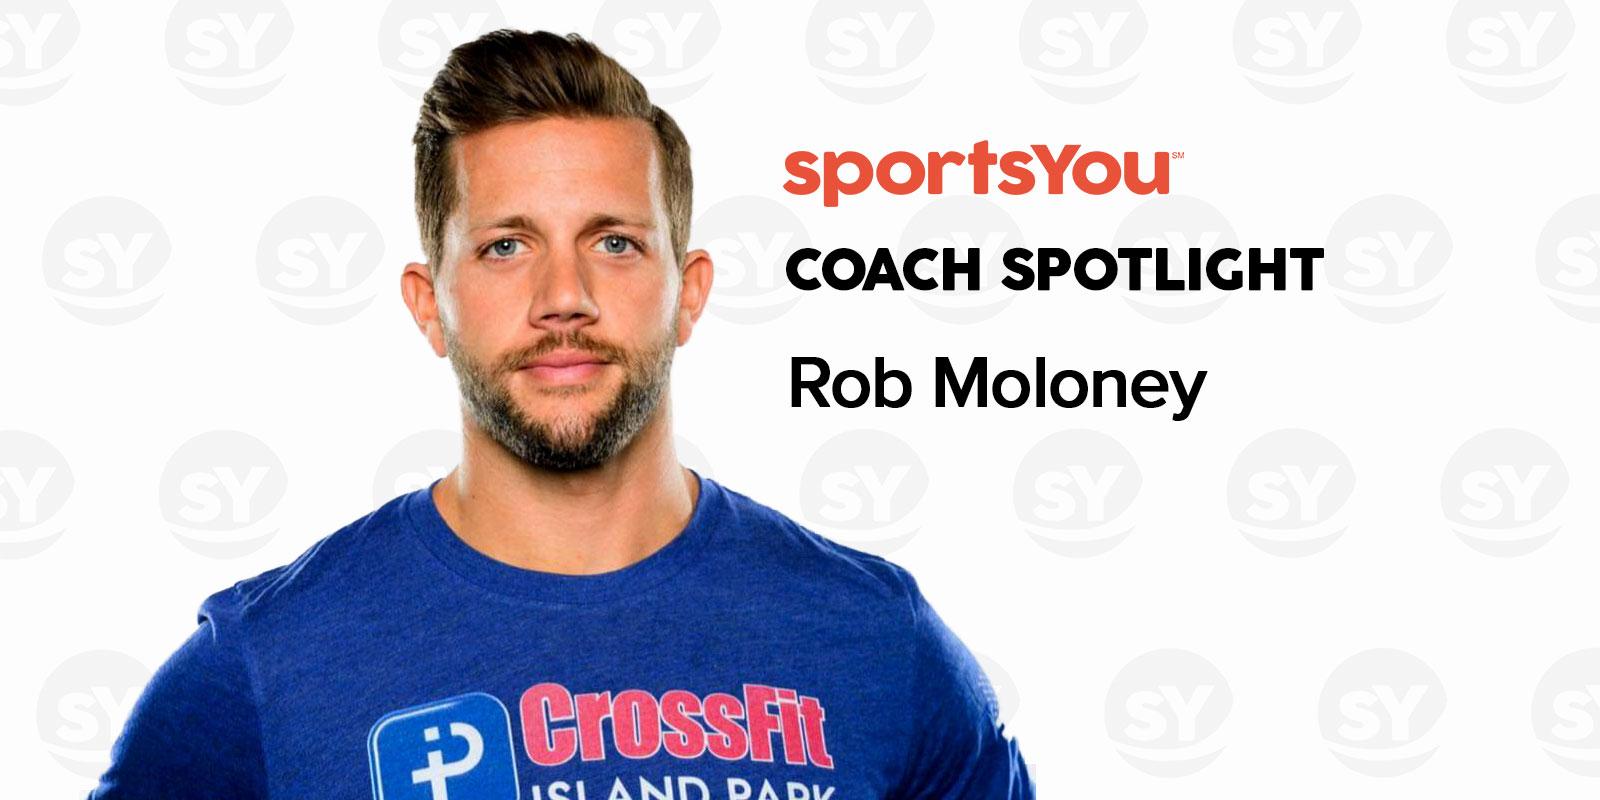 sportsYou Coach Spotlight: Q&A with Coach Rob Moloney